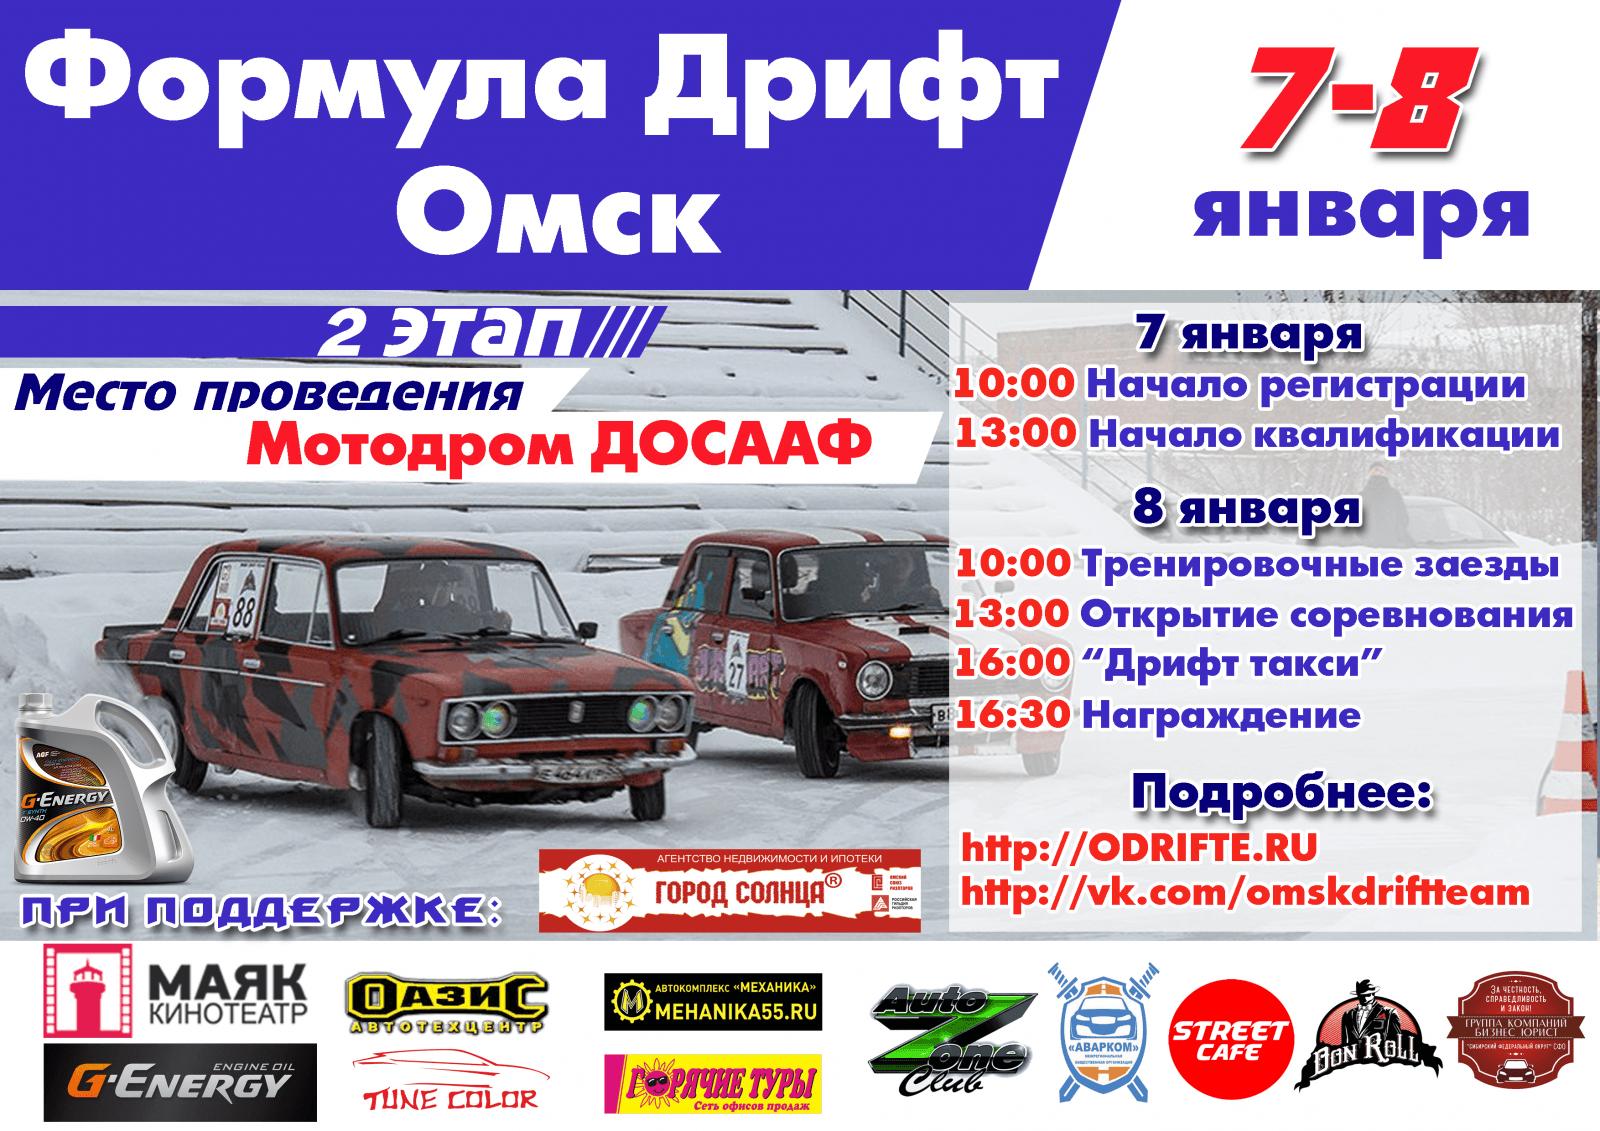 II Этап Кубка Омской области по дрифтингу » Формула Дрифт Омск. Зима'17 «